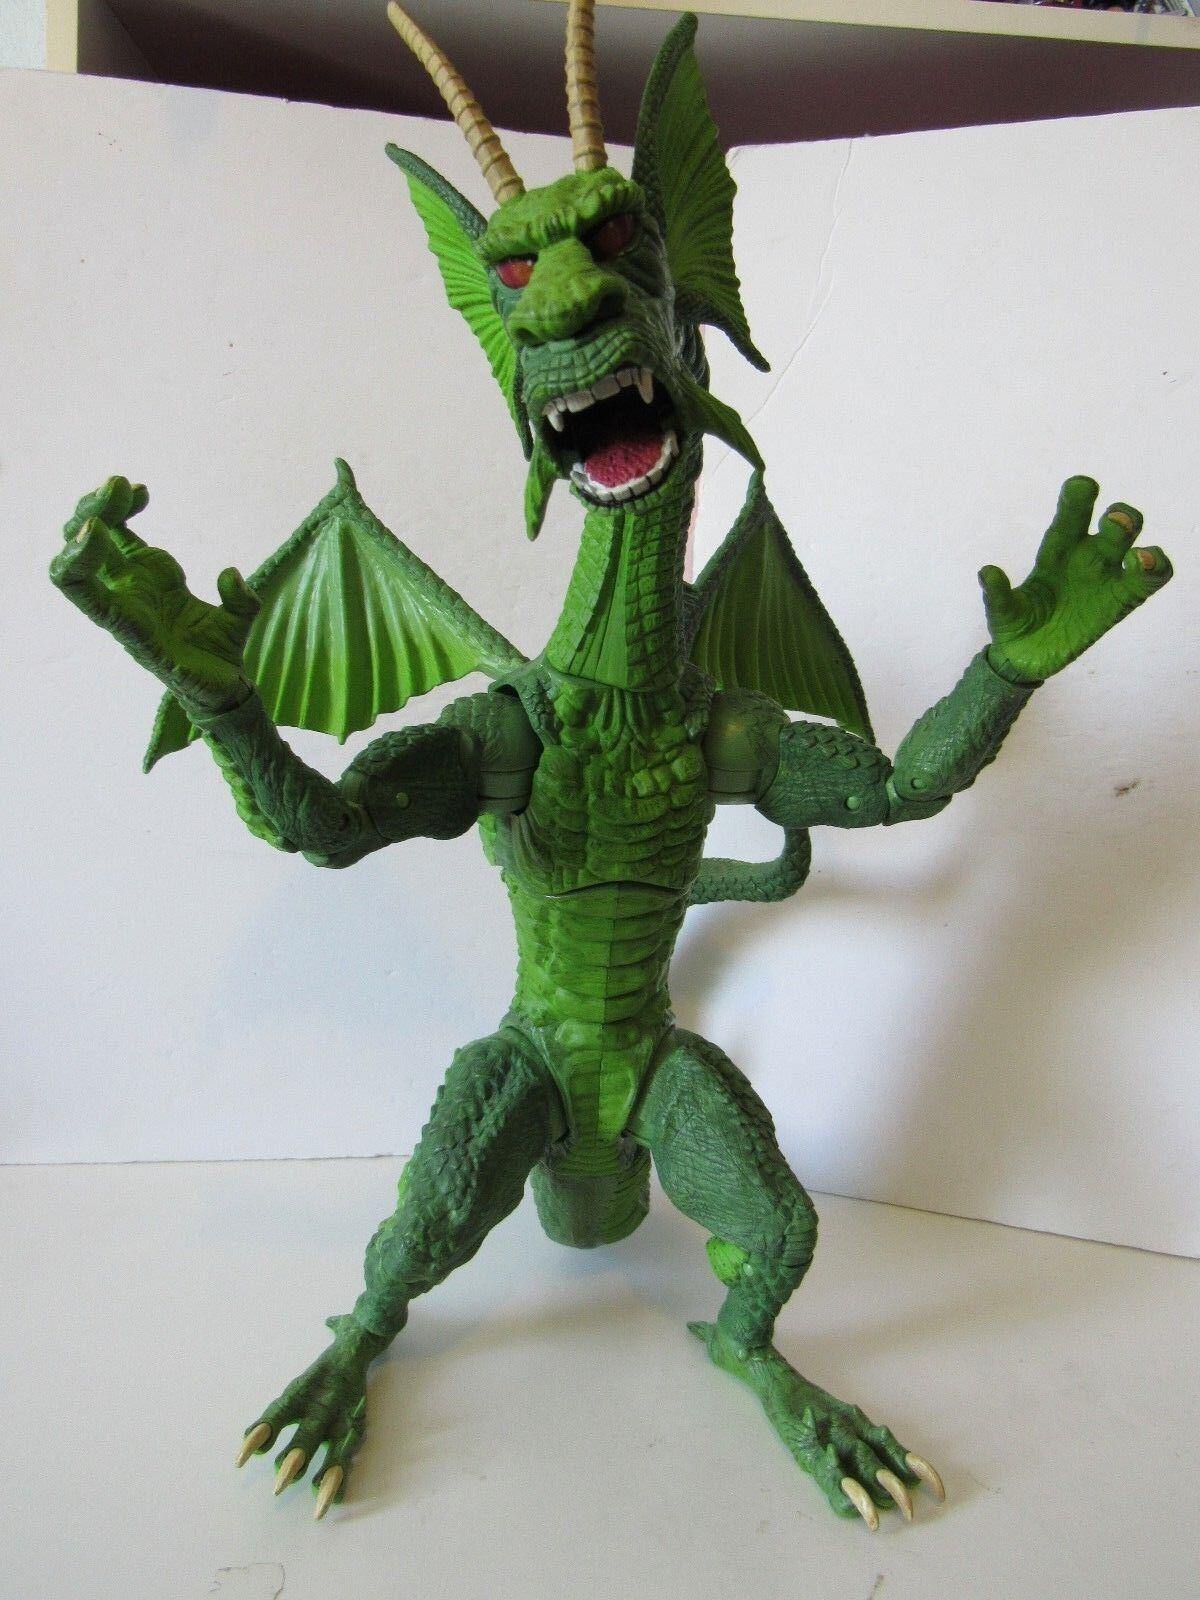 Hasbro Marvel Legends Fin Fang Foom BAF Build-a-Figure Complete